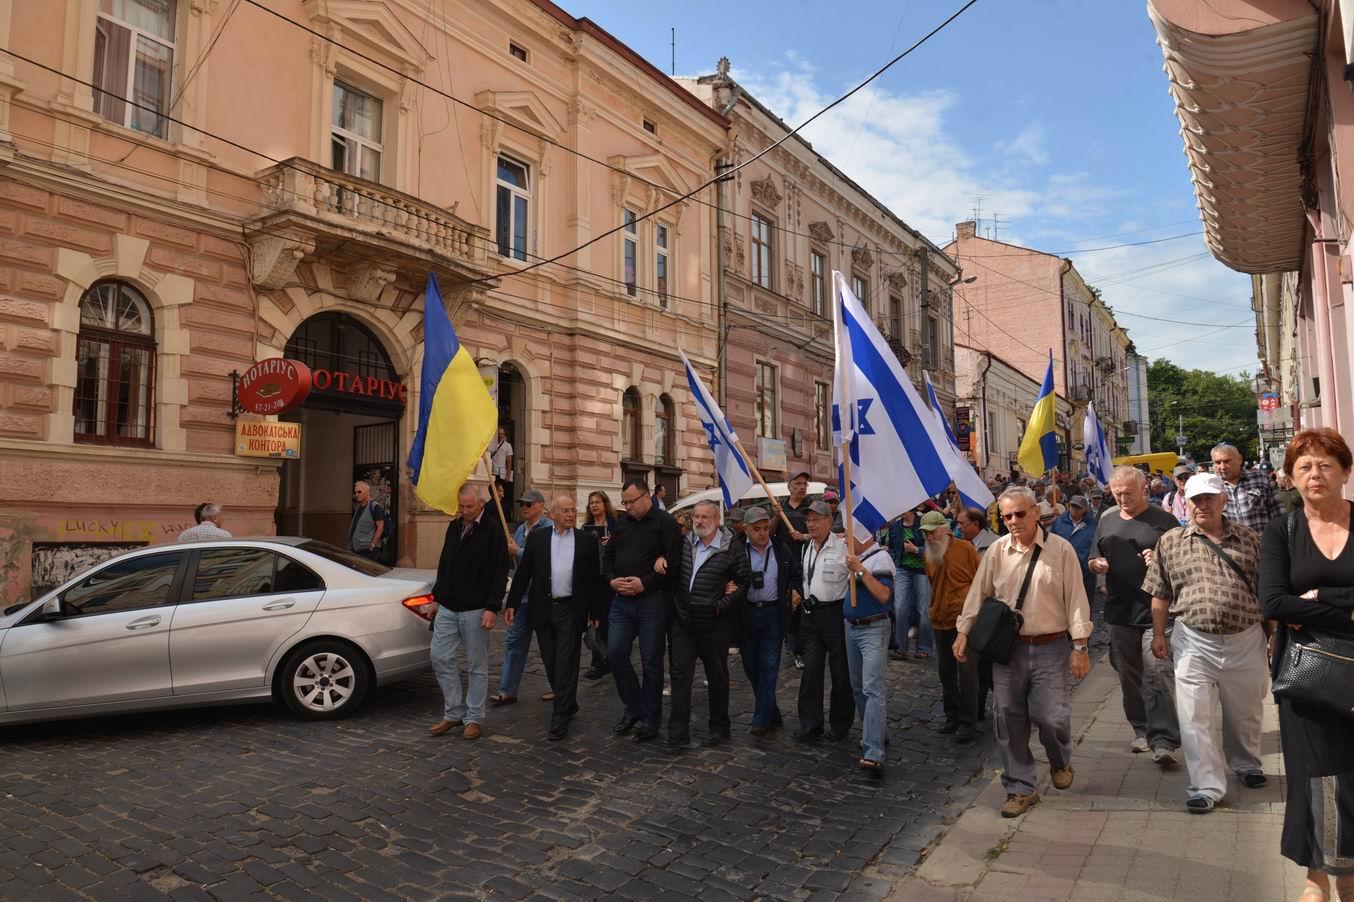 Resize of 2015-07 המצעד בצרנוביץ עם ראשי העיר